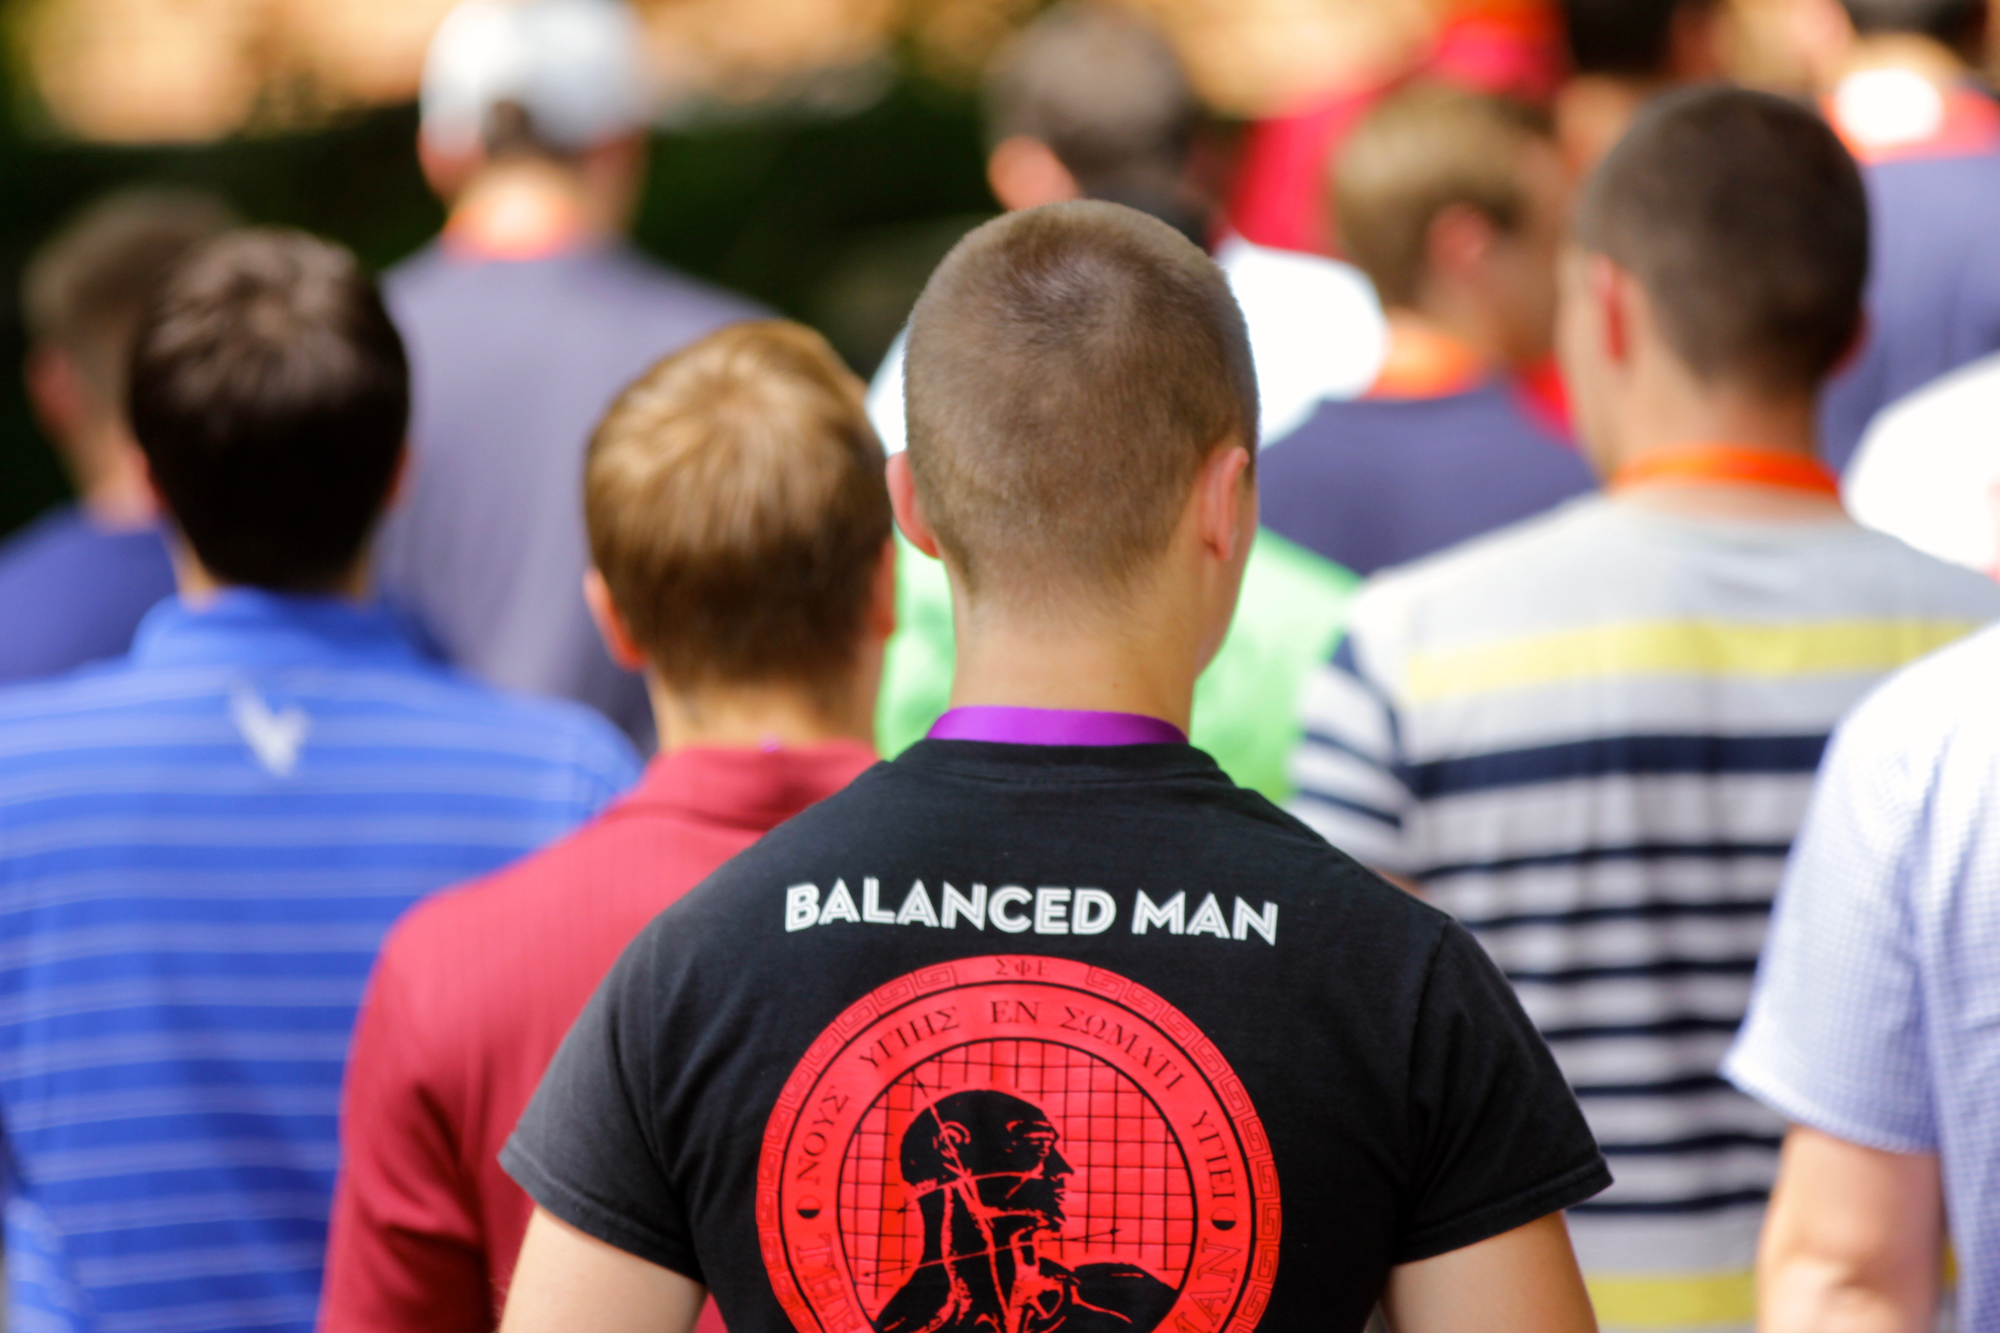 The Balanced Man Program